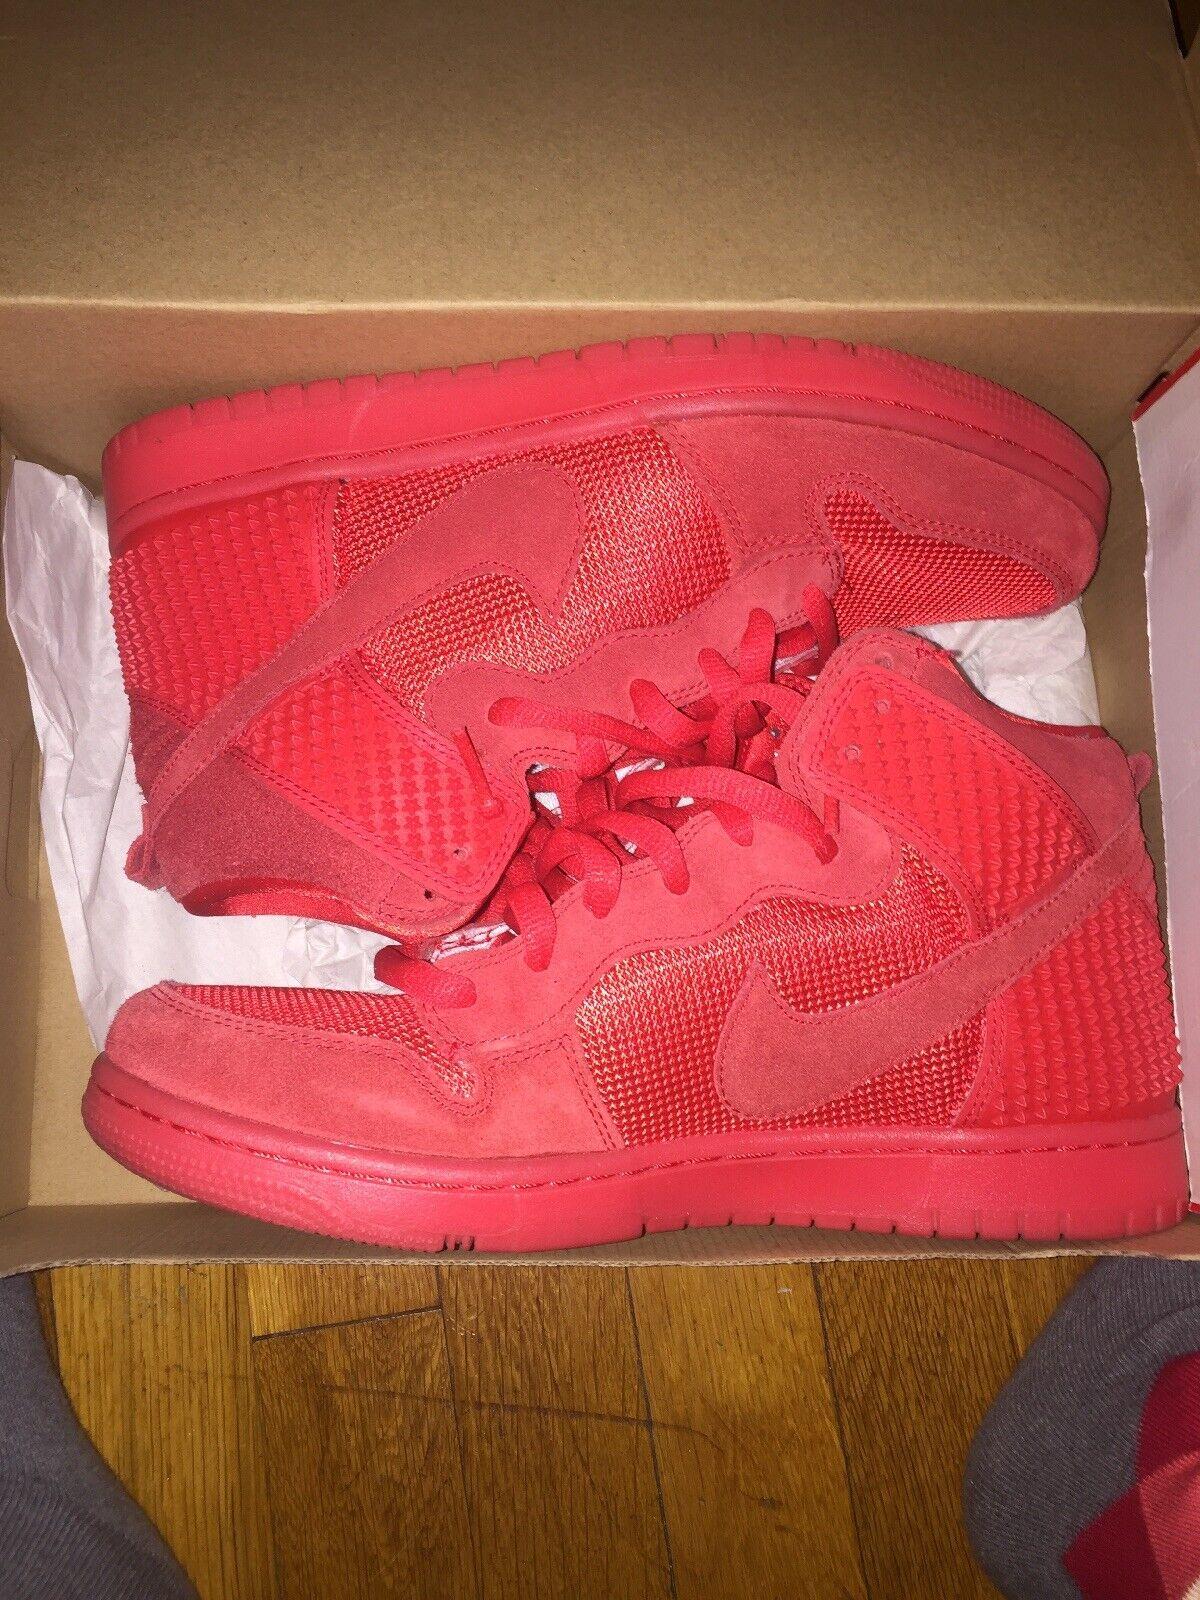 Nike dunk cmft prm Red October Pre Owned